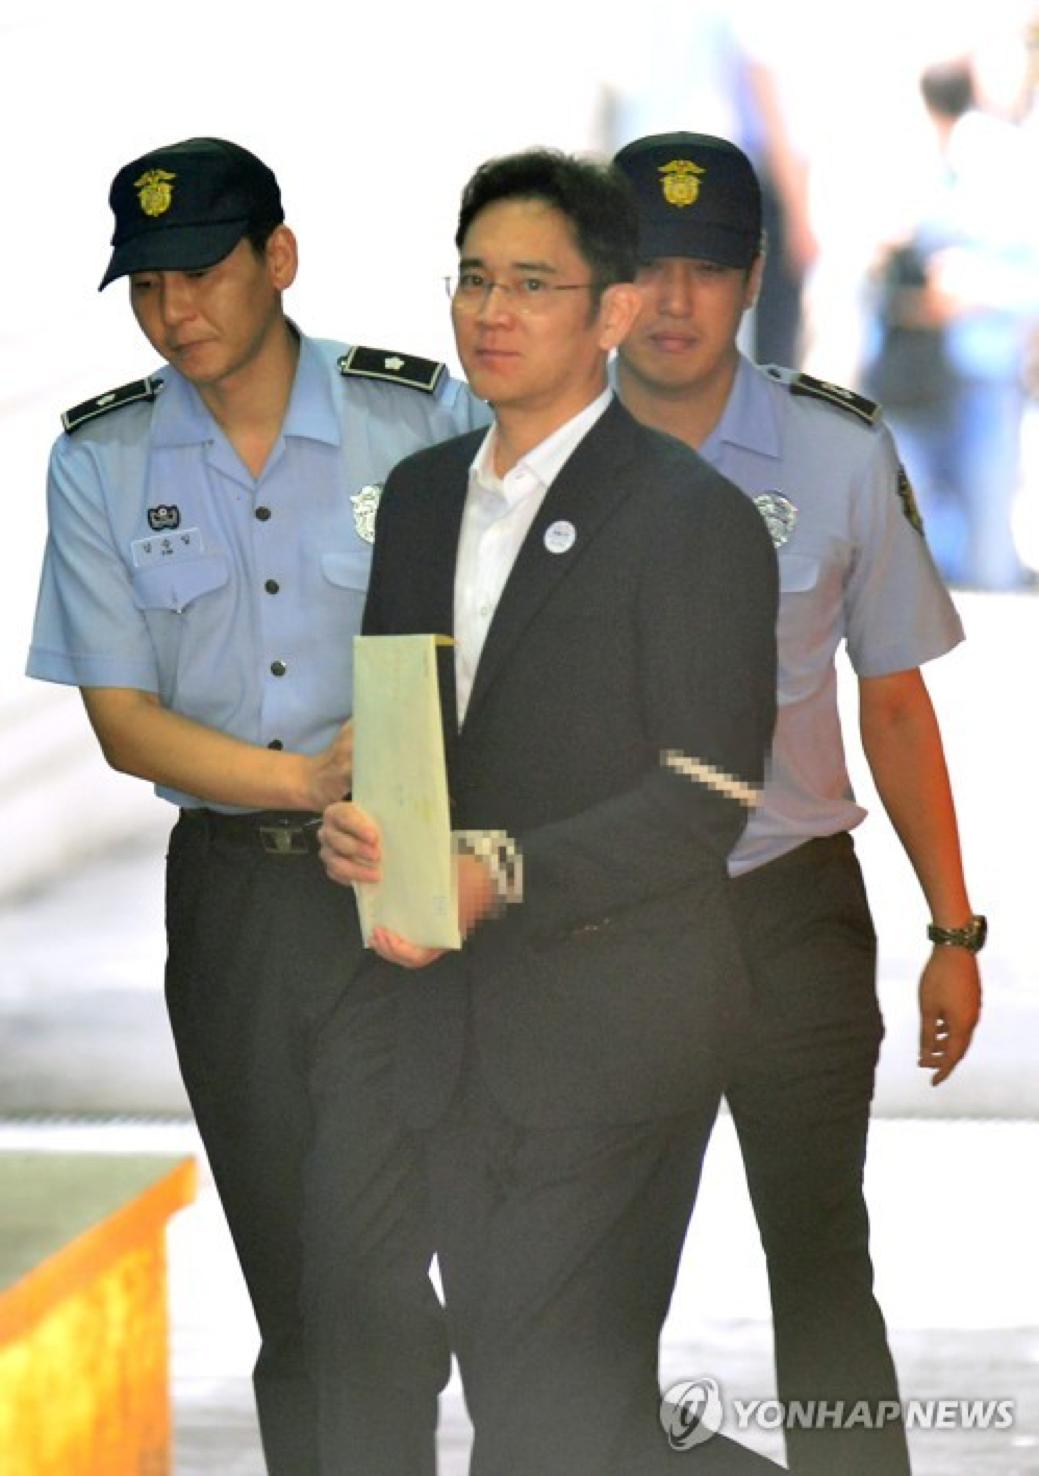 Vice-Presidente Da Samsung Electronics, Lee Jae-Yong, É Conduzido Ao Tribunal Após Chegar No Tribunal Central Distrital De Seul Em 25 De Agosto De 2017. (Yonhap)